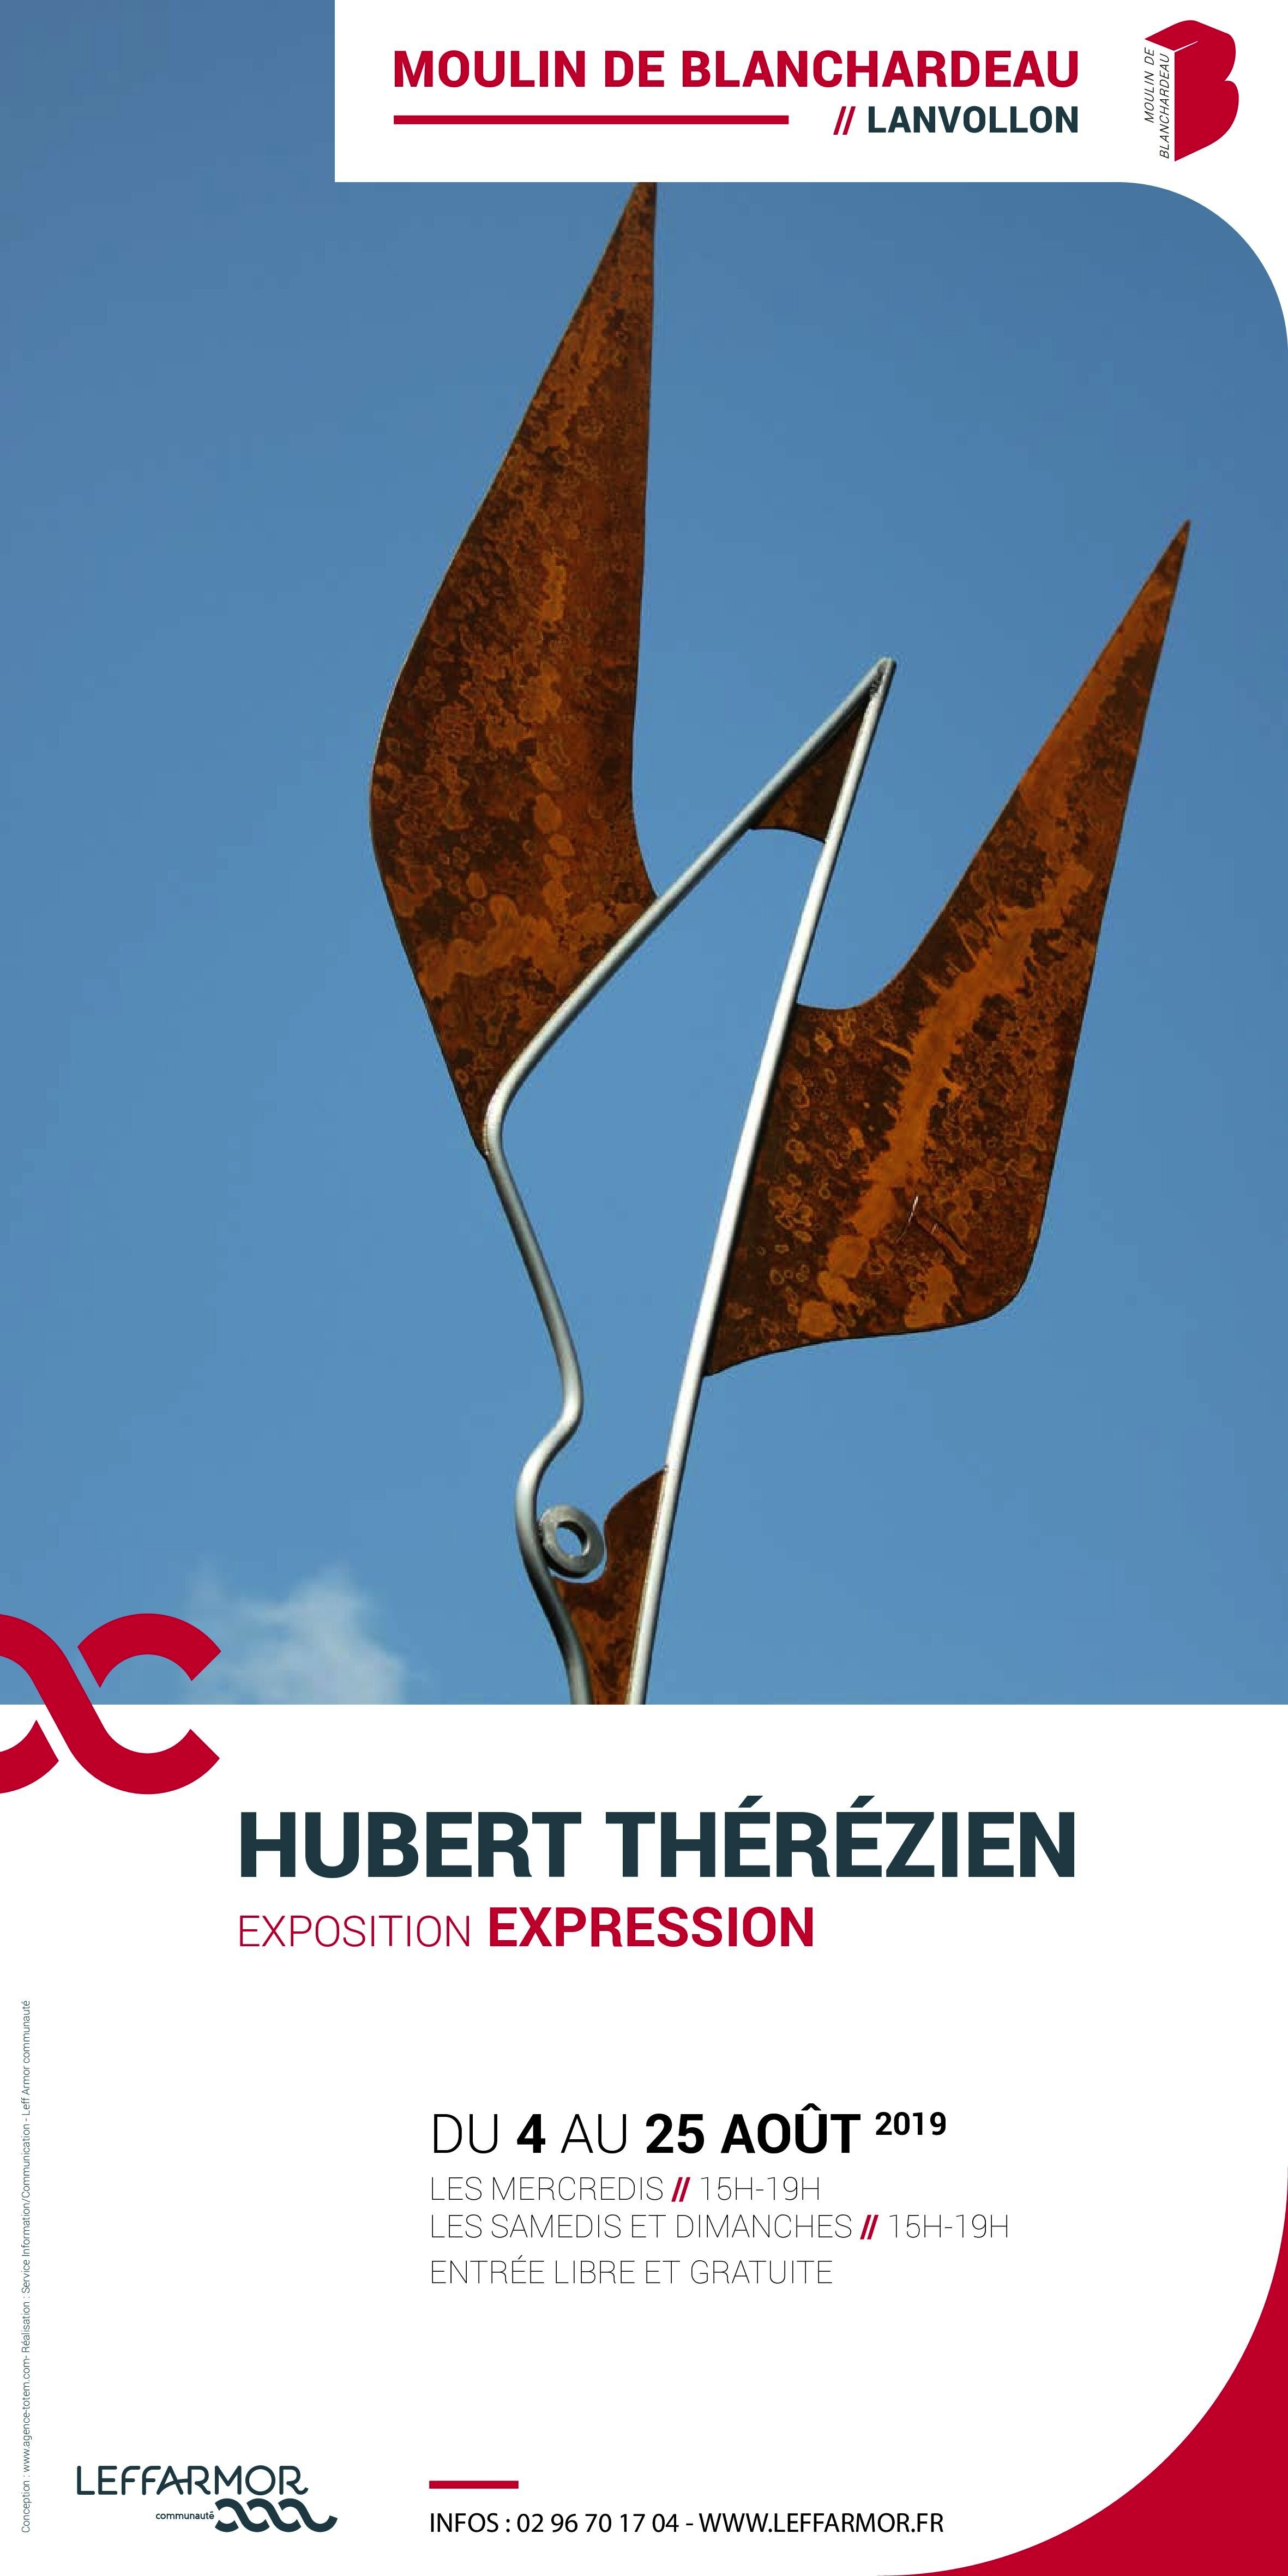 Affiche expo Hubert Thérézien v1